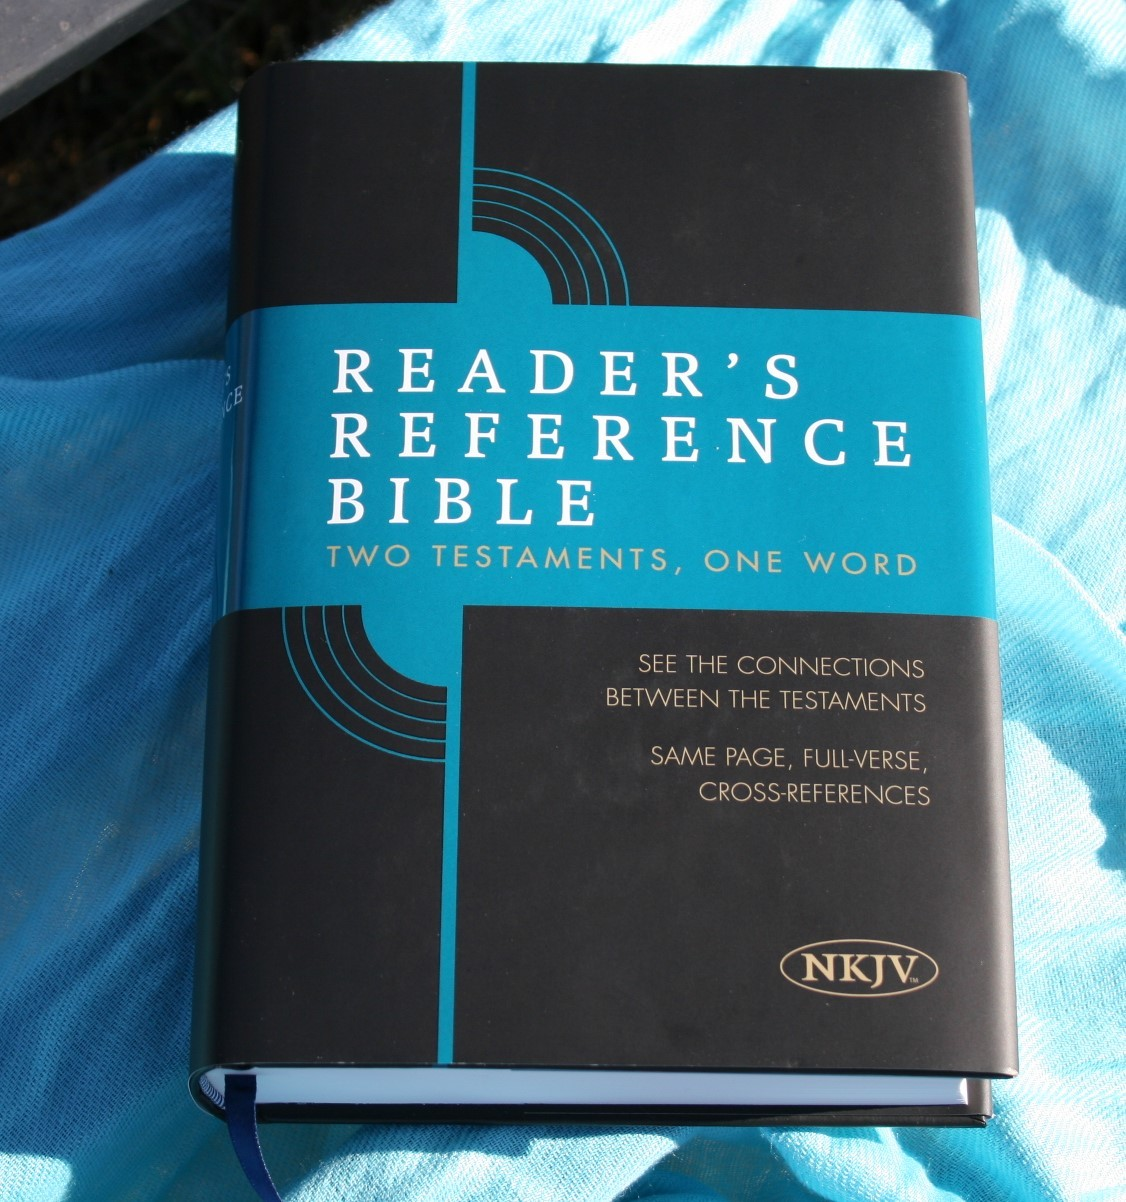 Holman Nkjv Reader S Reference Bible Review Bible